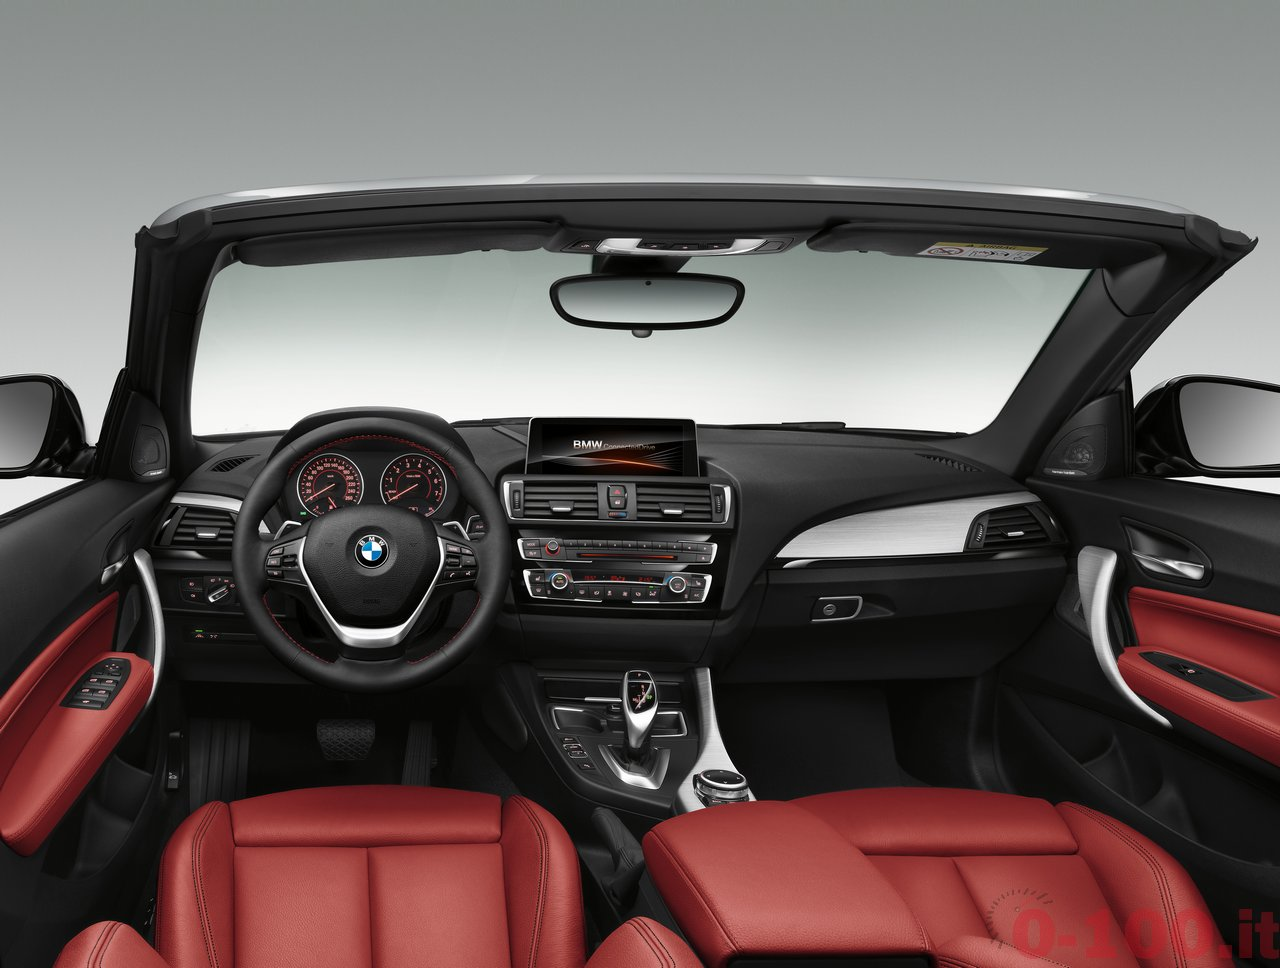 bmw-serie-2-235i-220i-220d-cabriolet_0-100_9